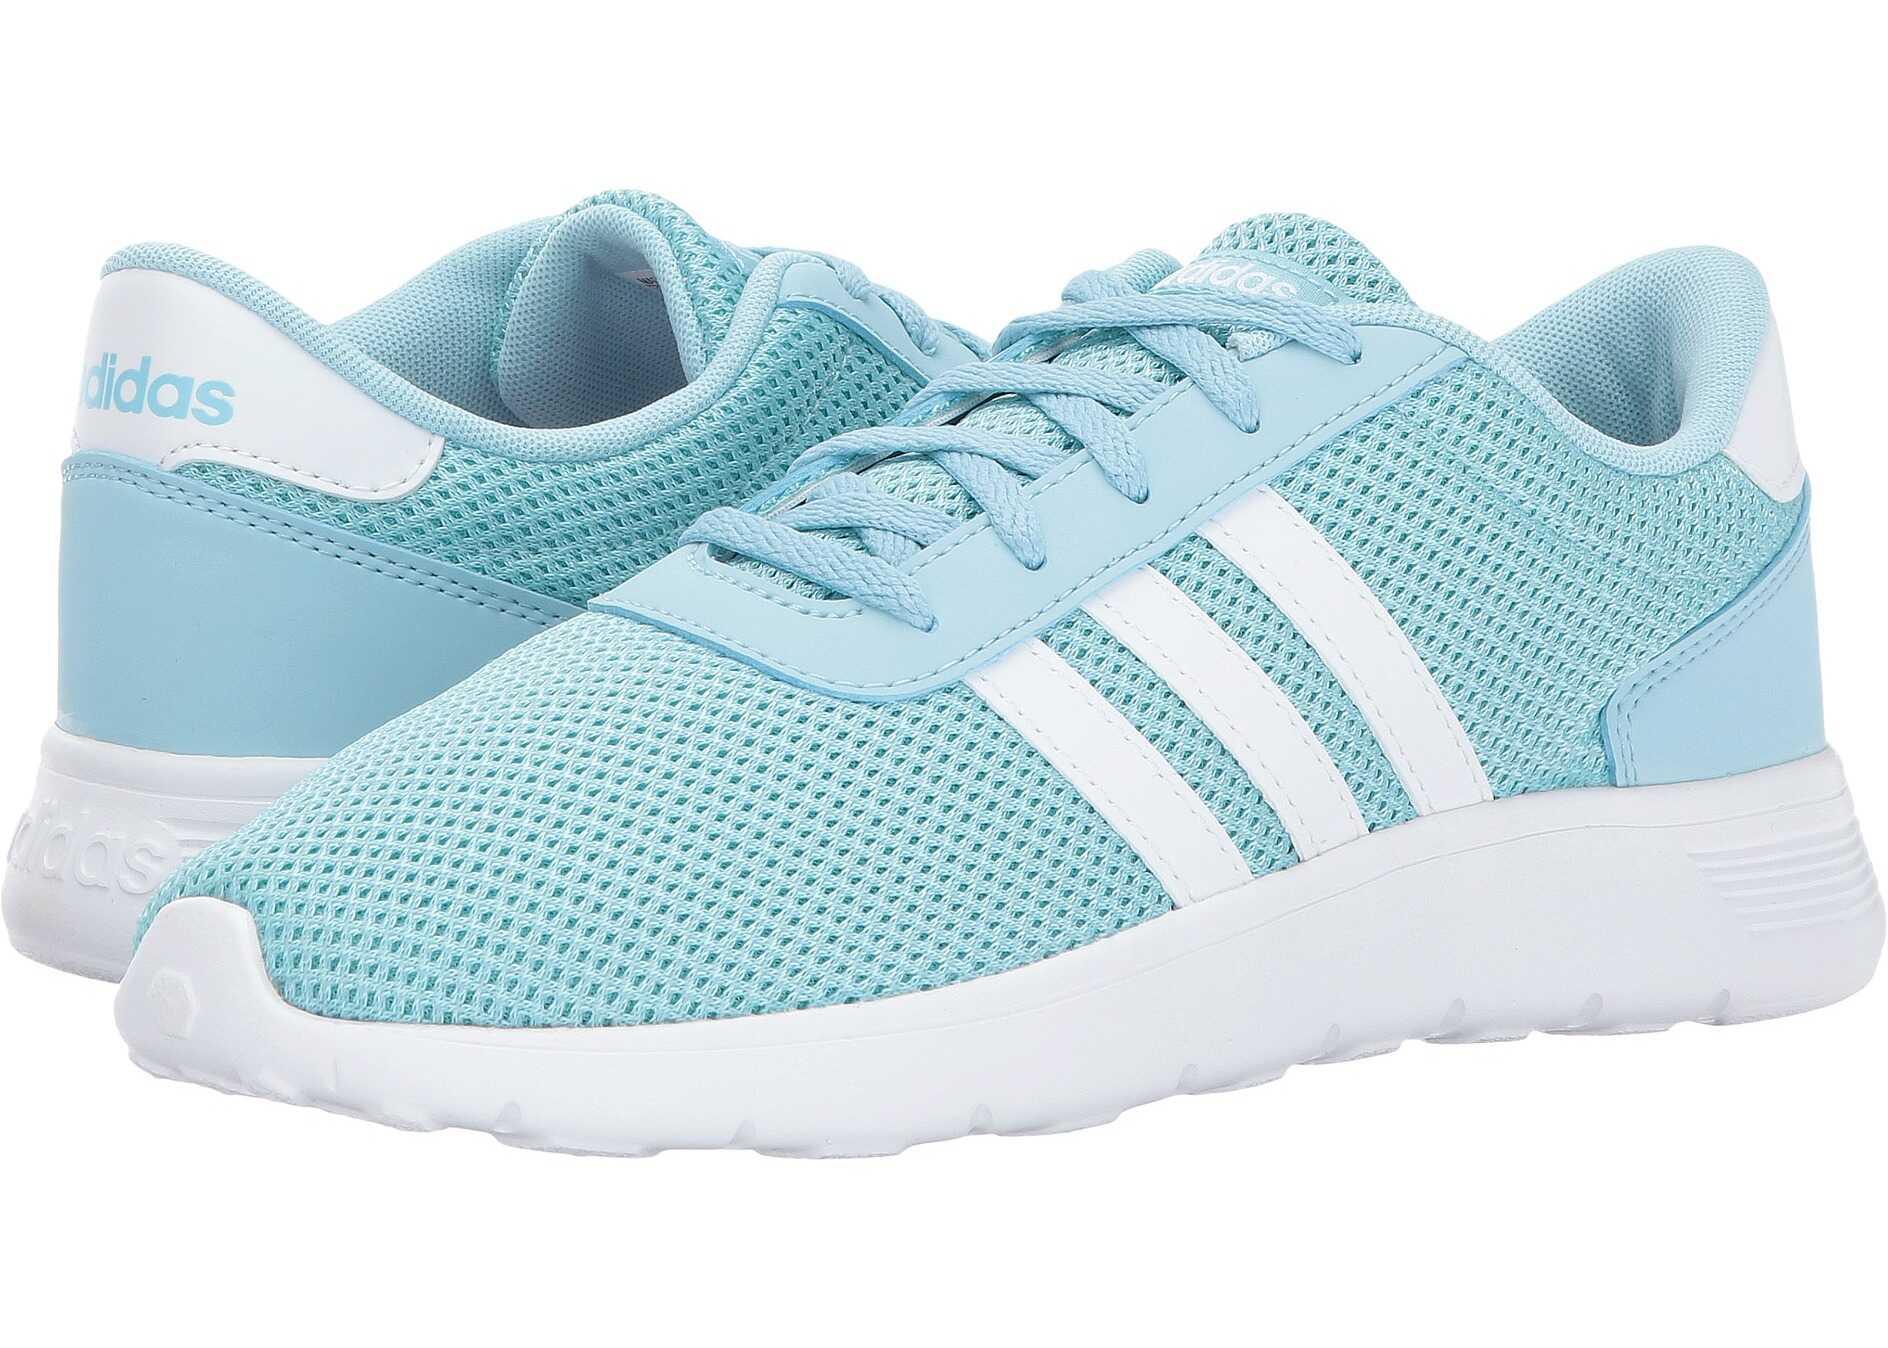 adidas Kids Lite Racer (Little Kid/Big Kid) Icy Blue/Footwear White/Energy Aqua